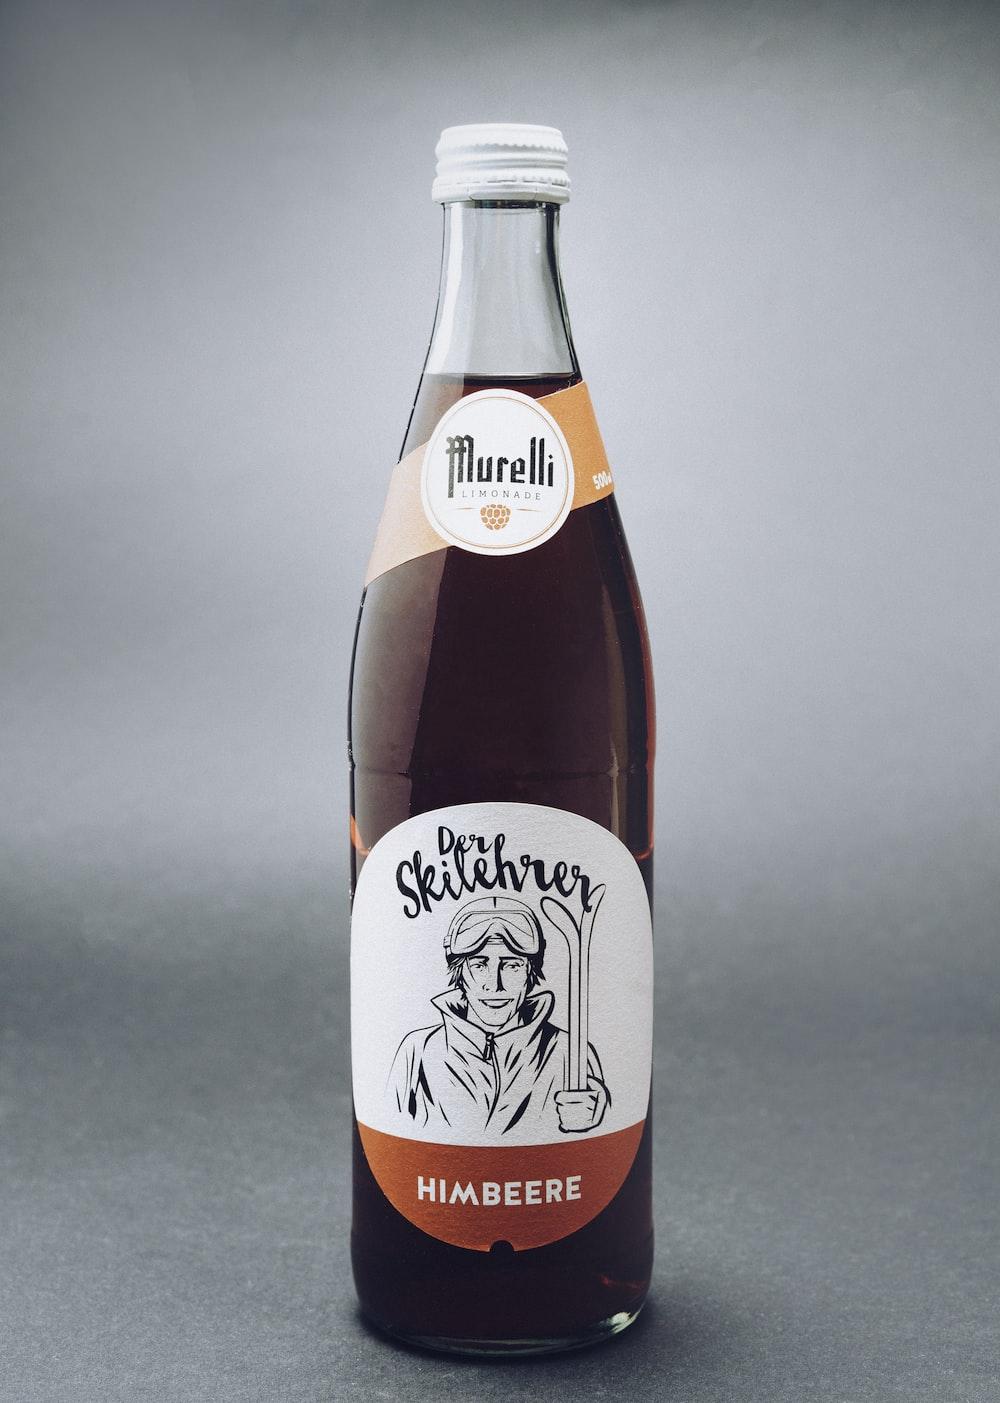 Murelli Himbeere bottle